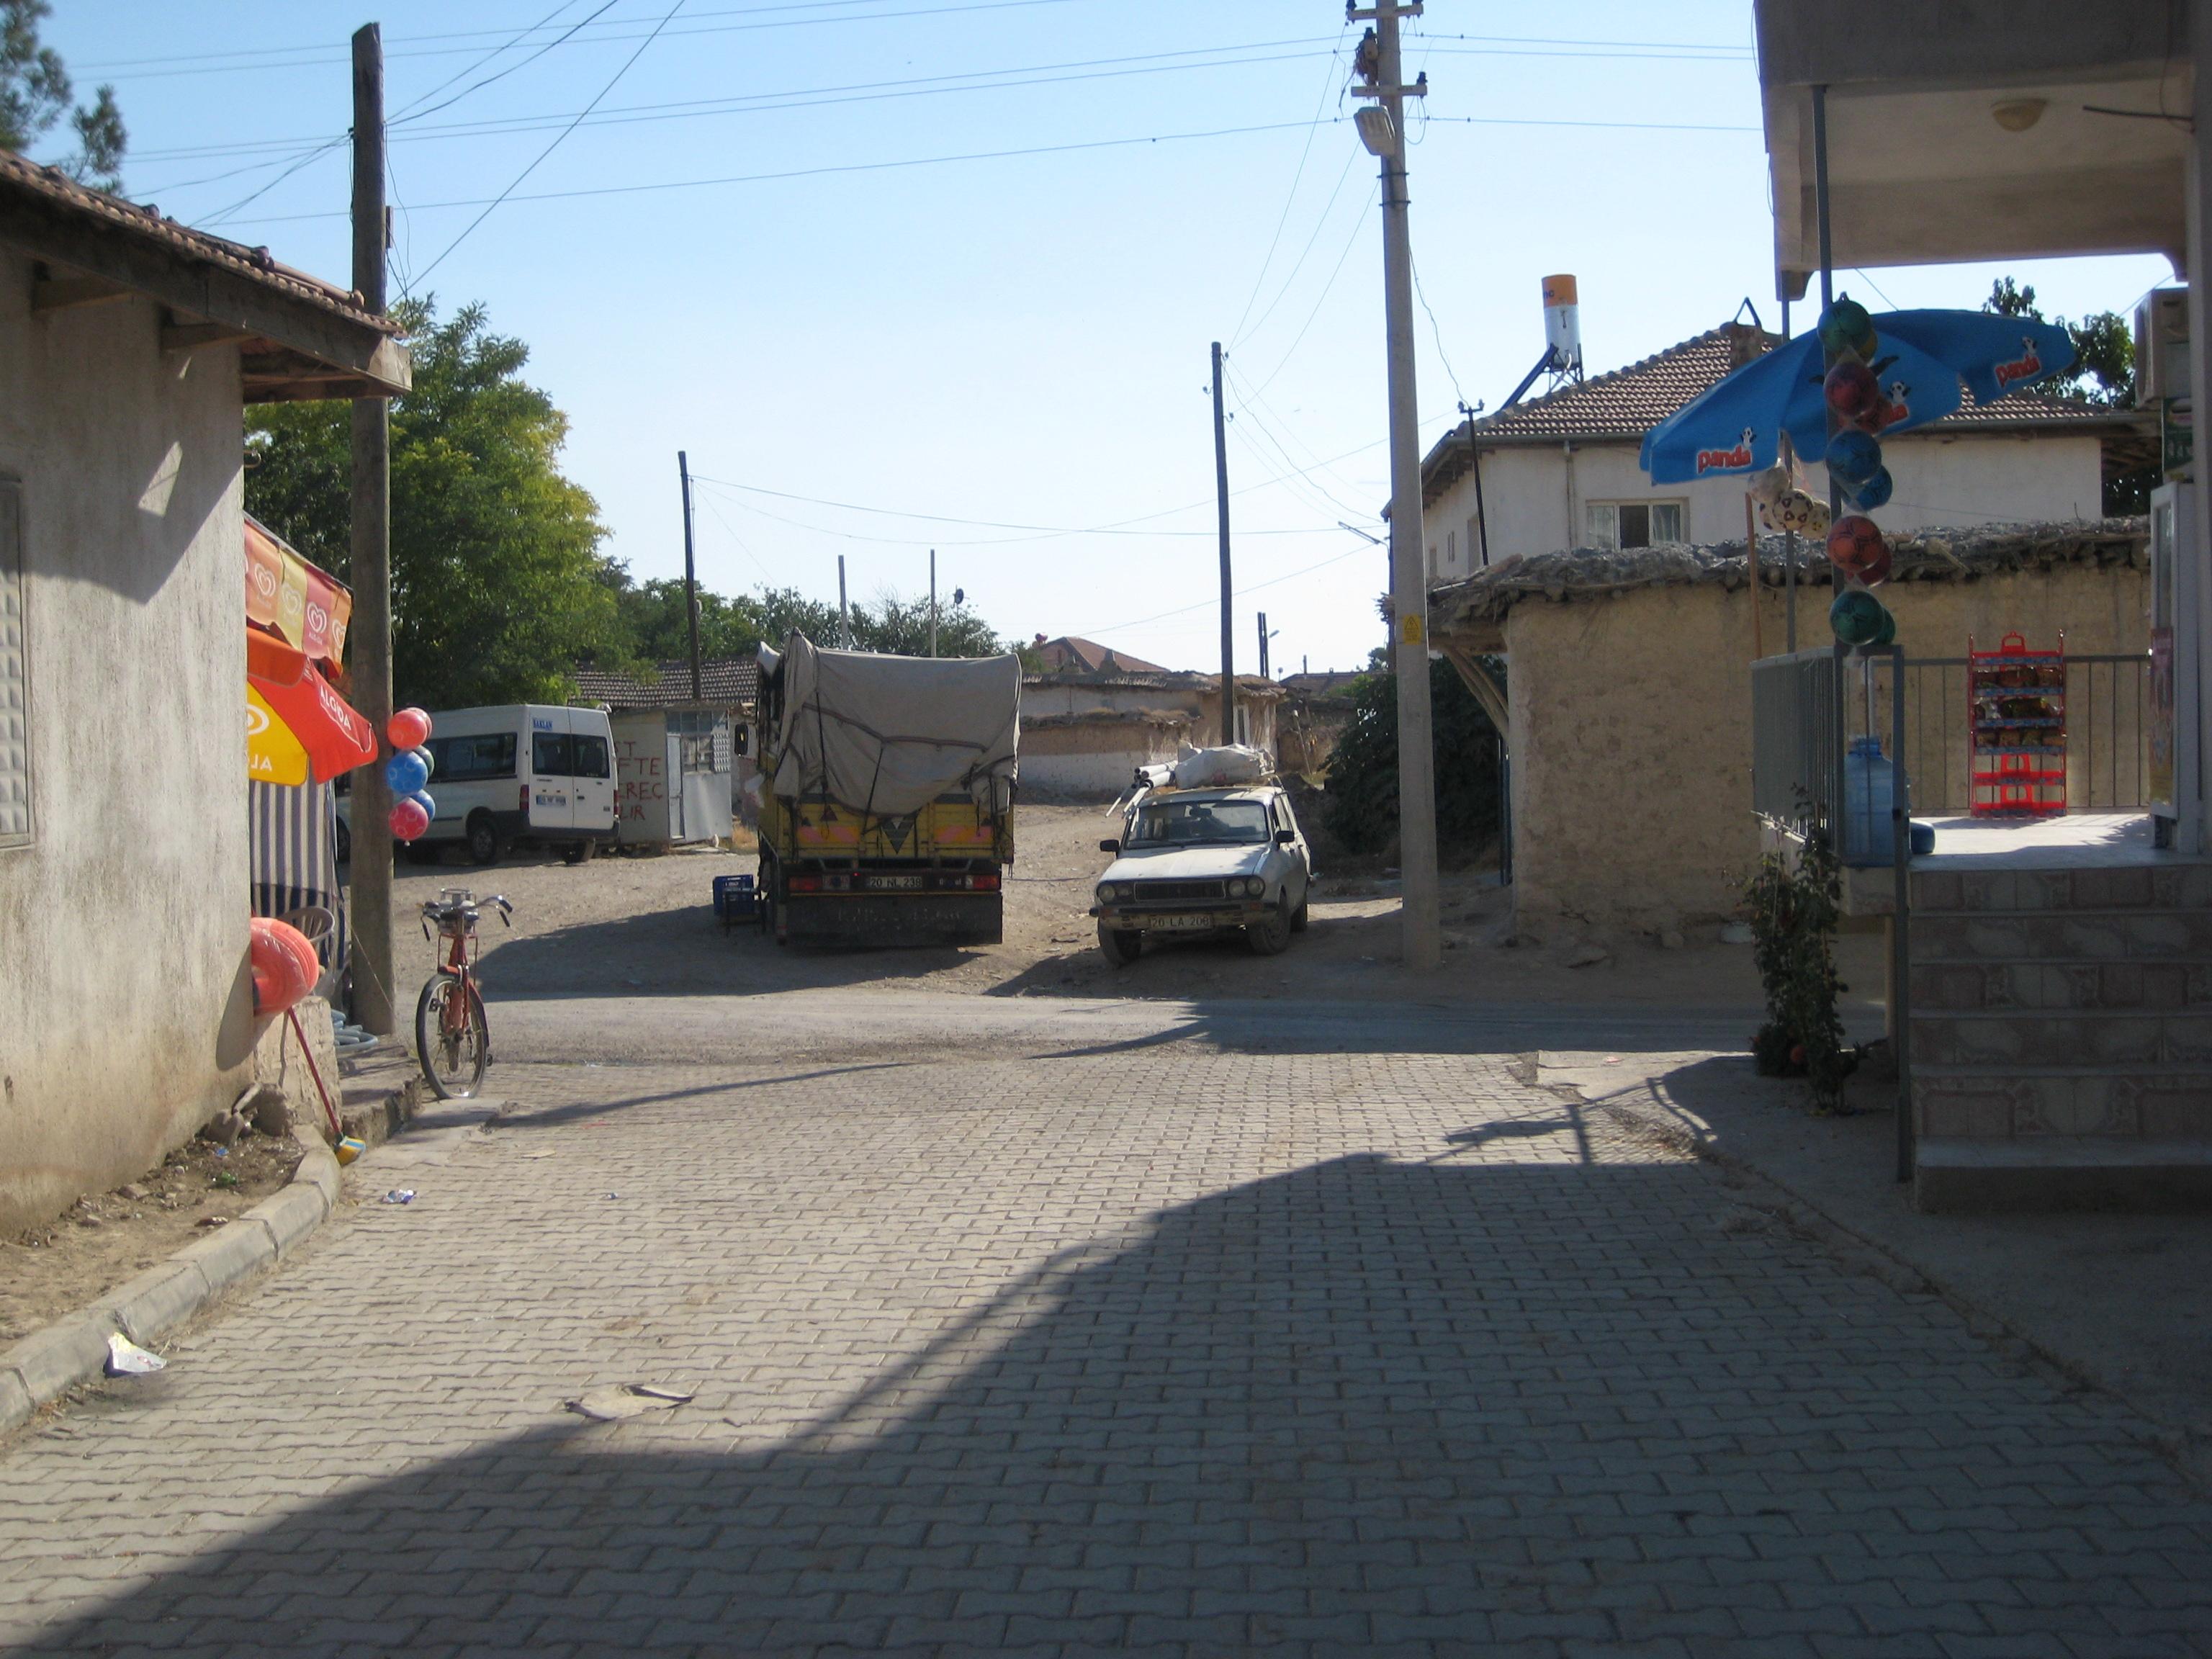 Ataköy baklan Köy Meydanı